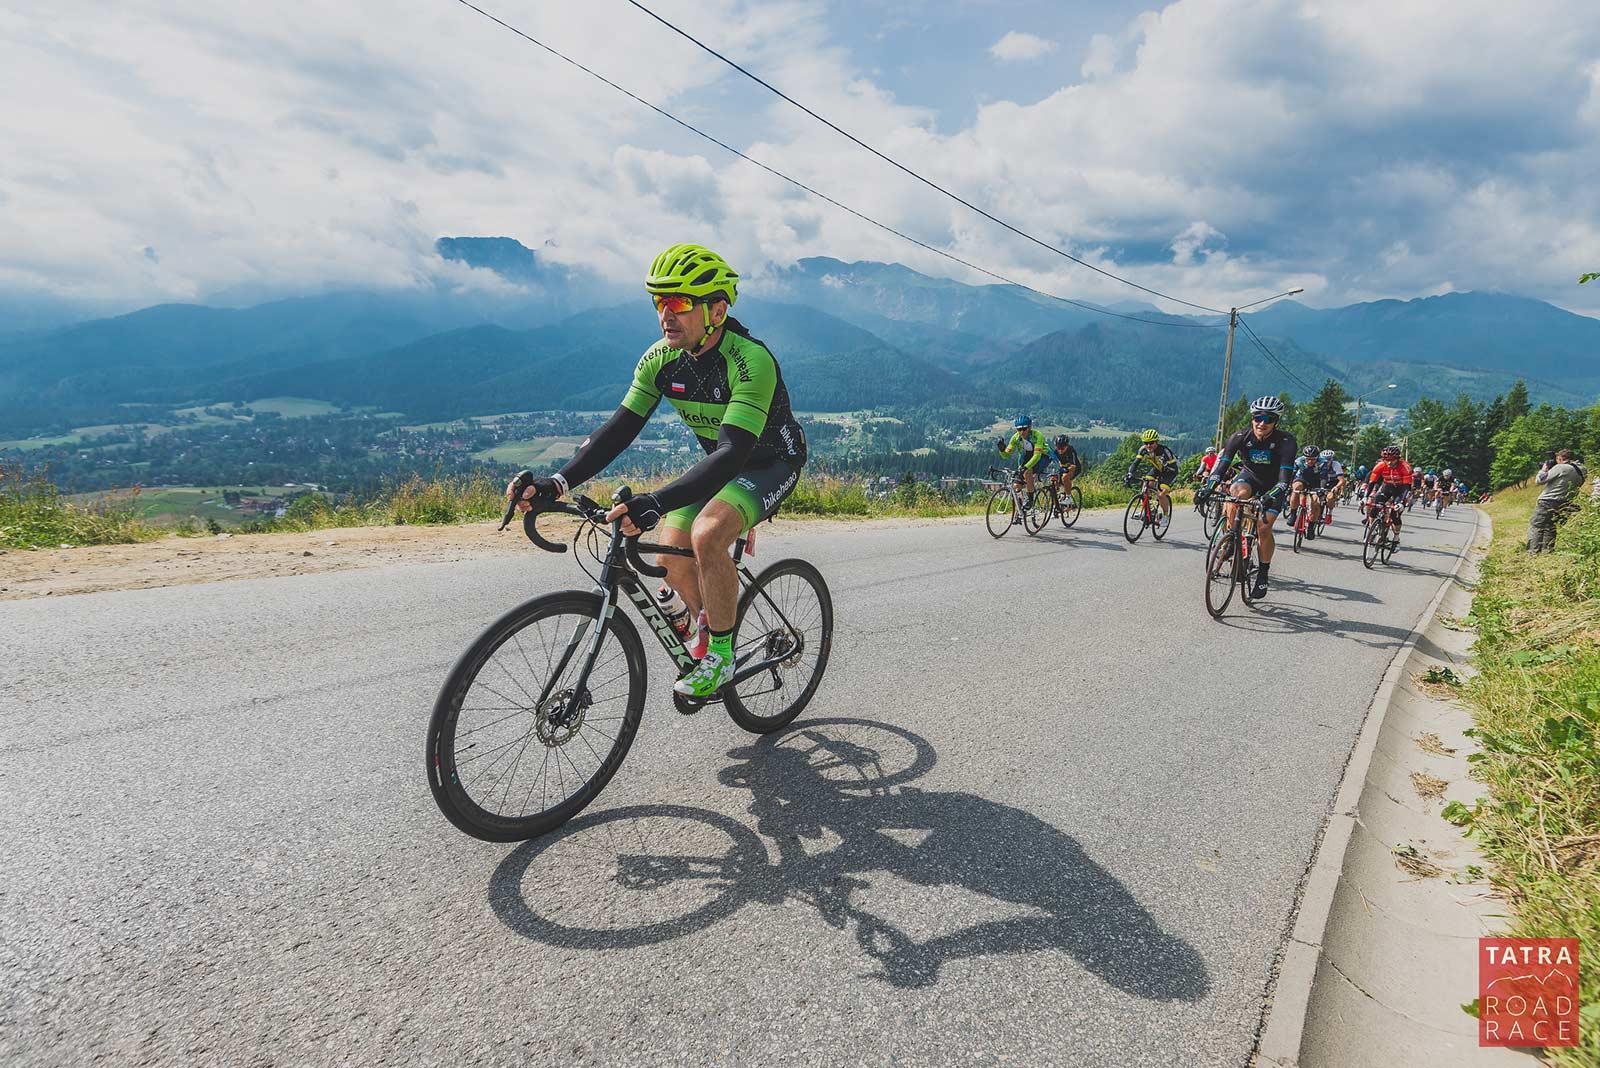 Tatra-Road-Race-4